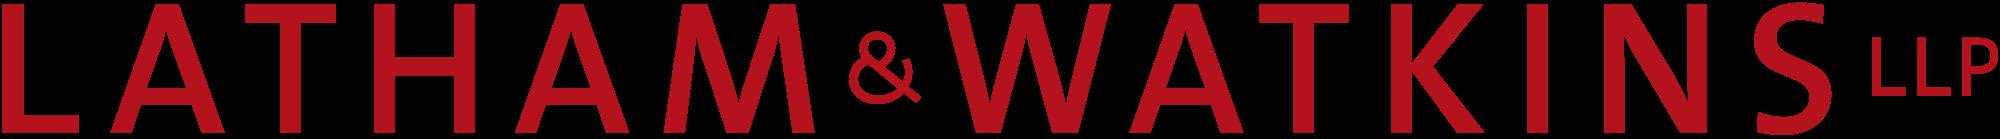 2000px-Latham_&_Watkins_Logo.svg